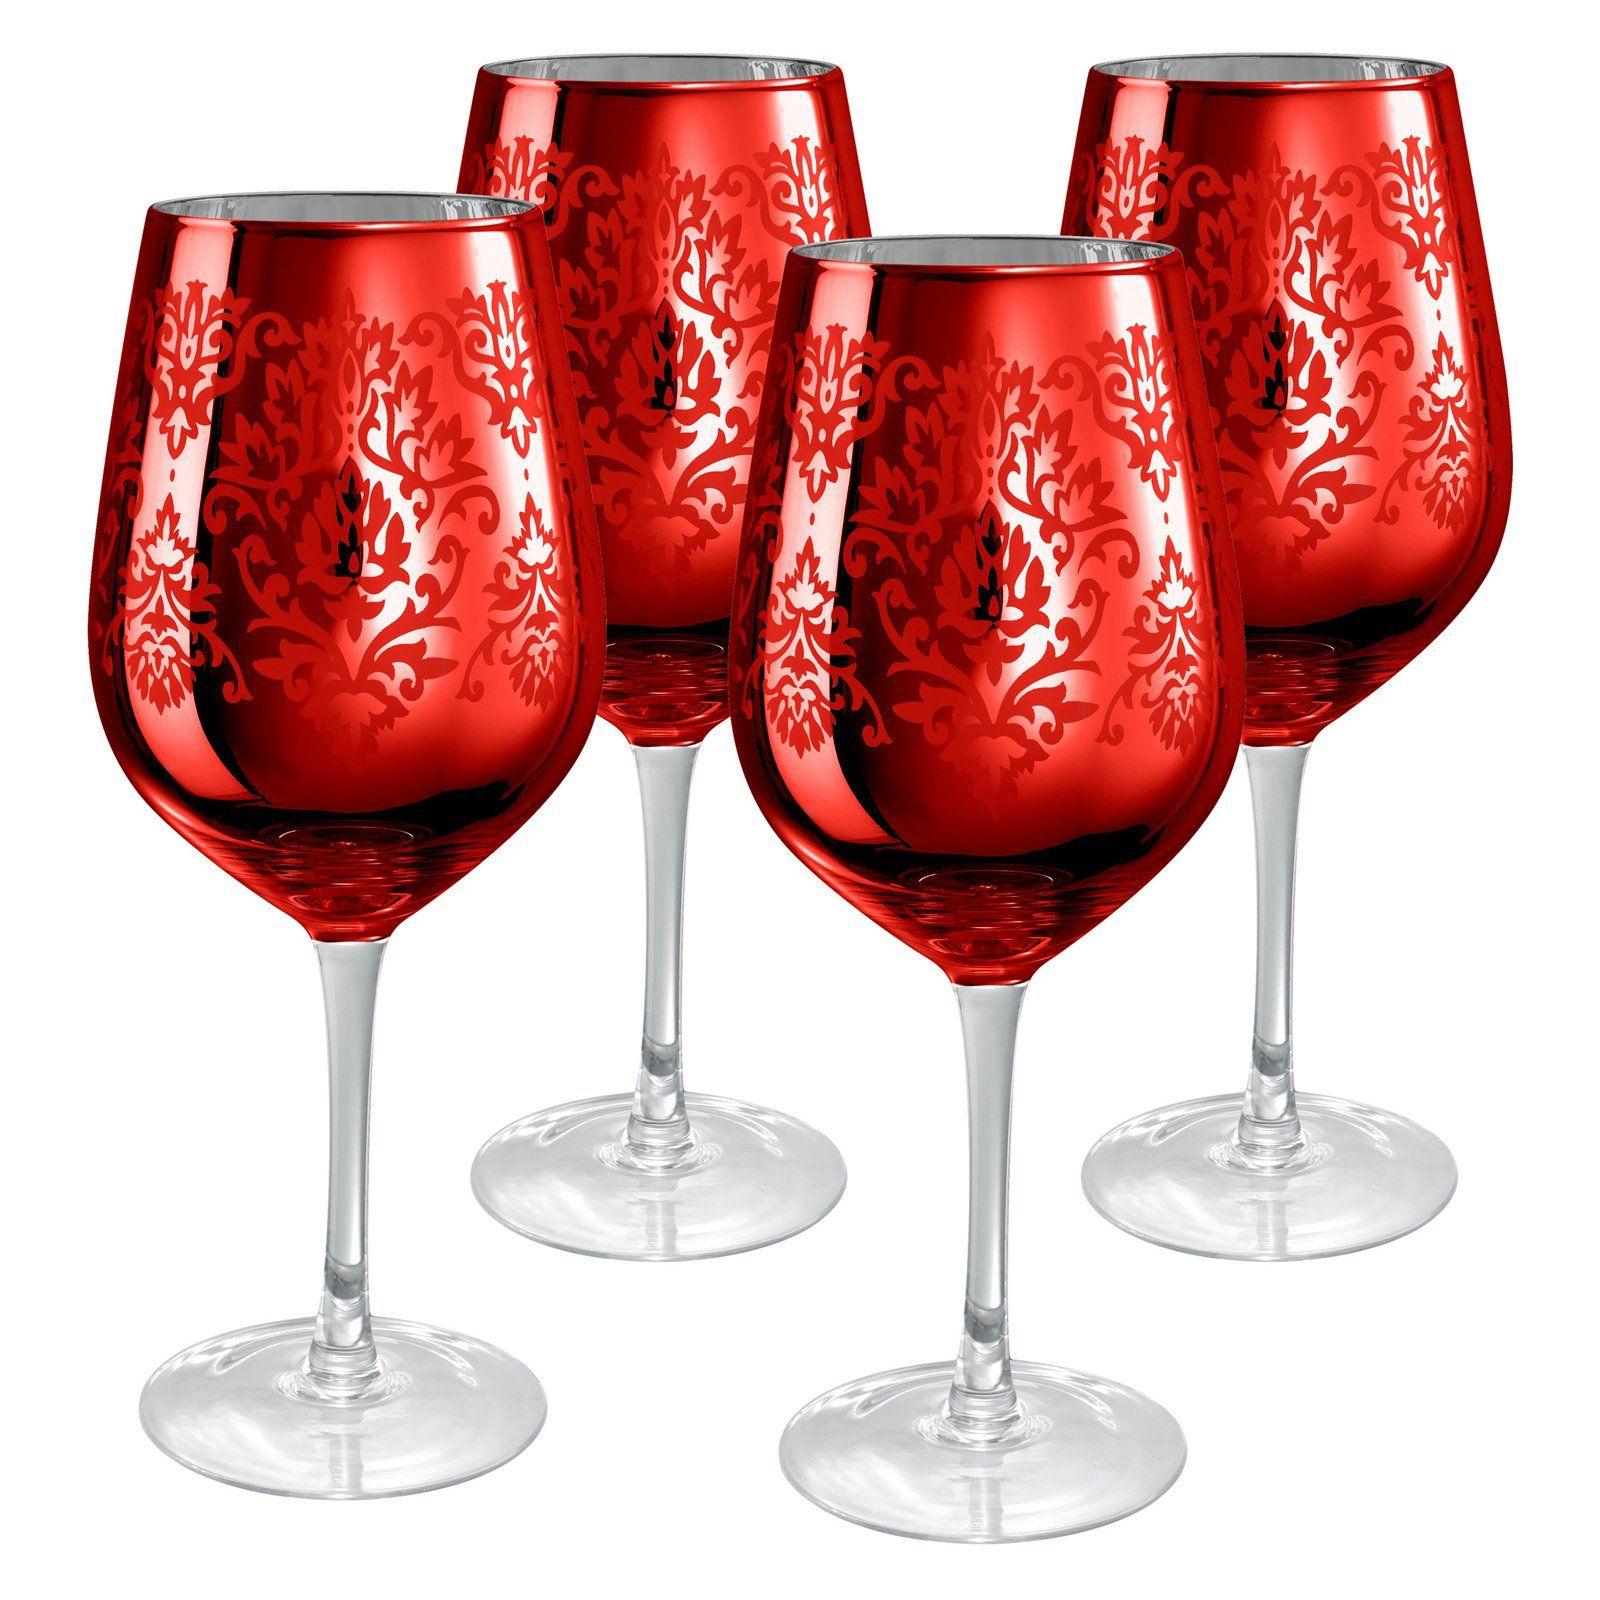 Artland Inc Red Brocade Goblet Glasses Set Of 4 From Hayneedle Com Wine Glass Set Wine Glass Fun Wine Glasses